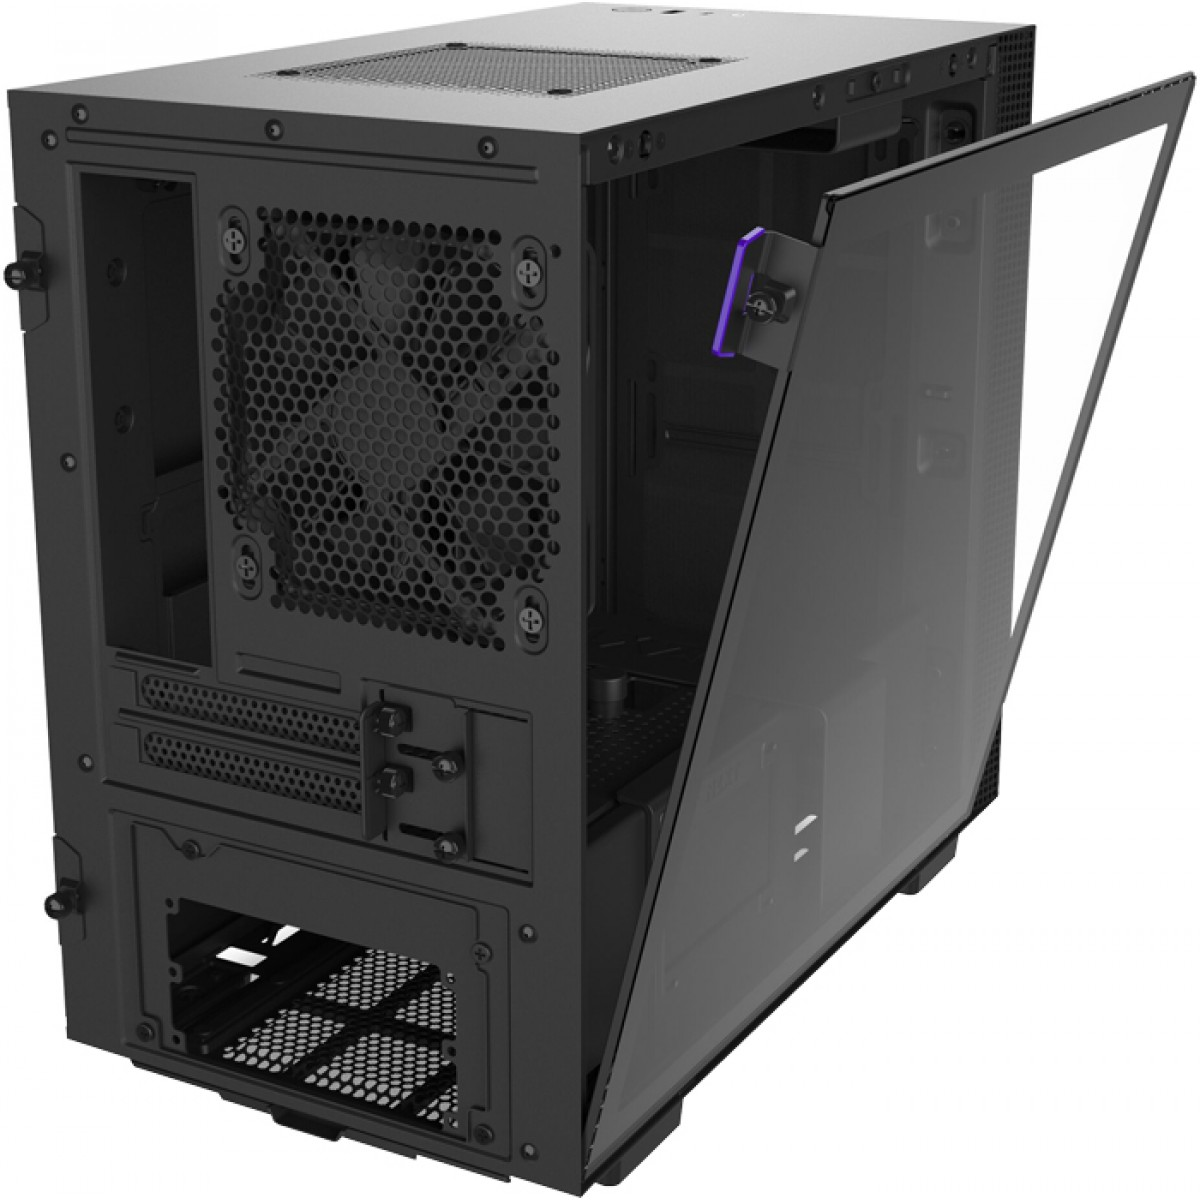 Gabinete Gamer NZXT H210i, Mini Tower, Vidro Temperado, Black, Sem Fonte, Com 2 Fans, CA-H210I-B1 - Open Box